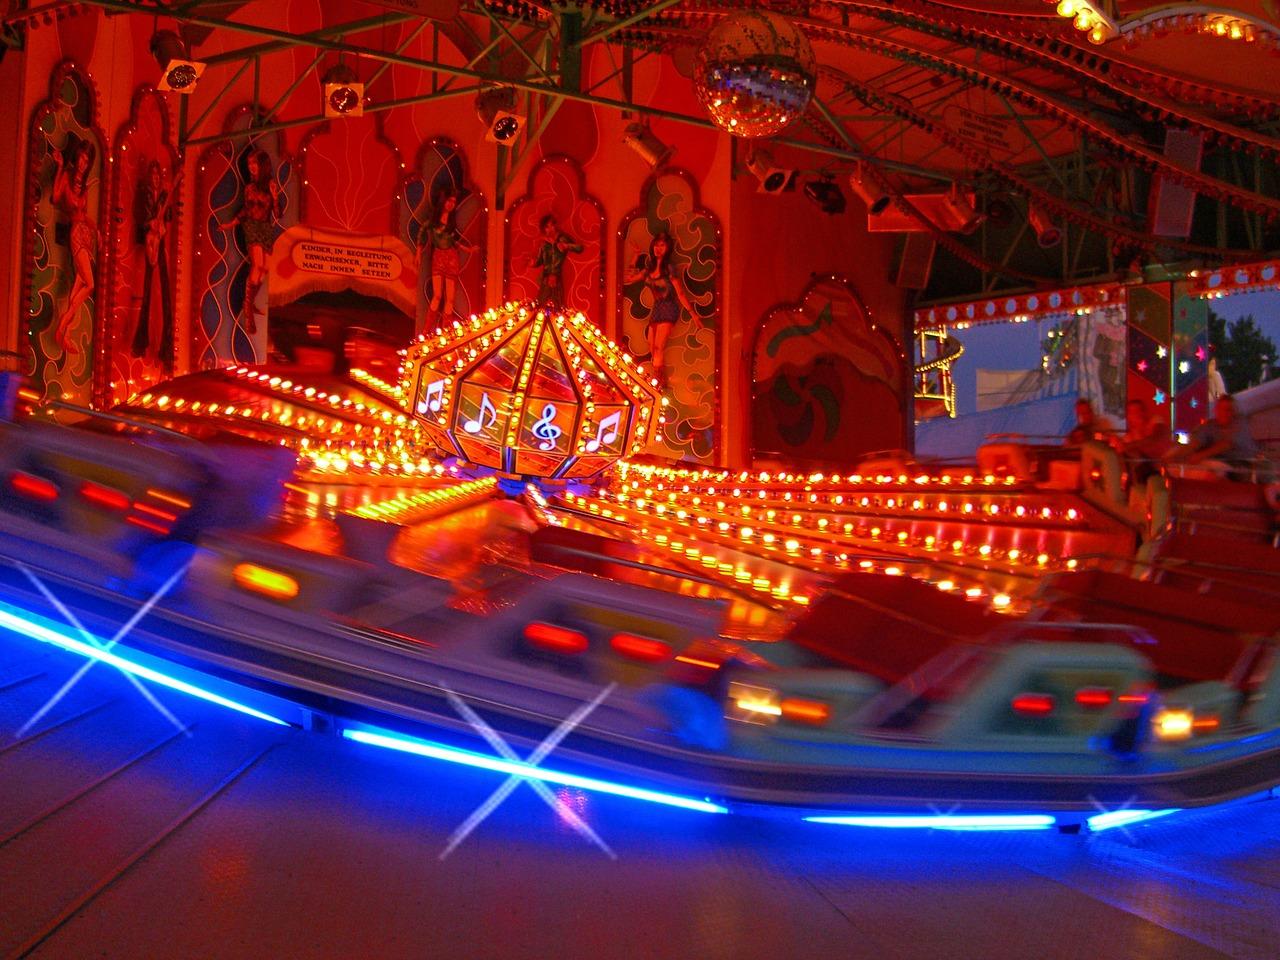 carousel-518193_1280.jpg